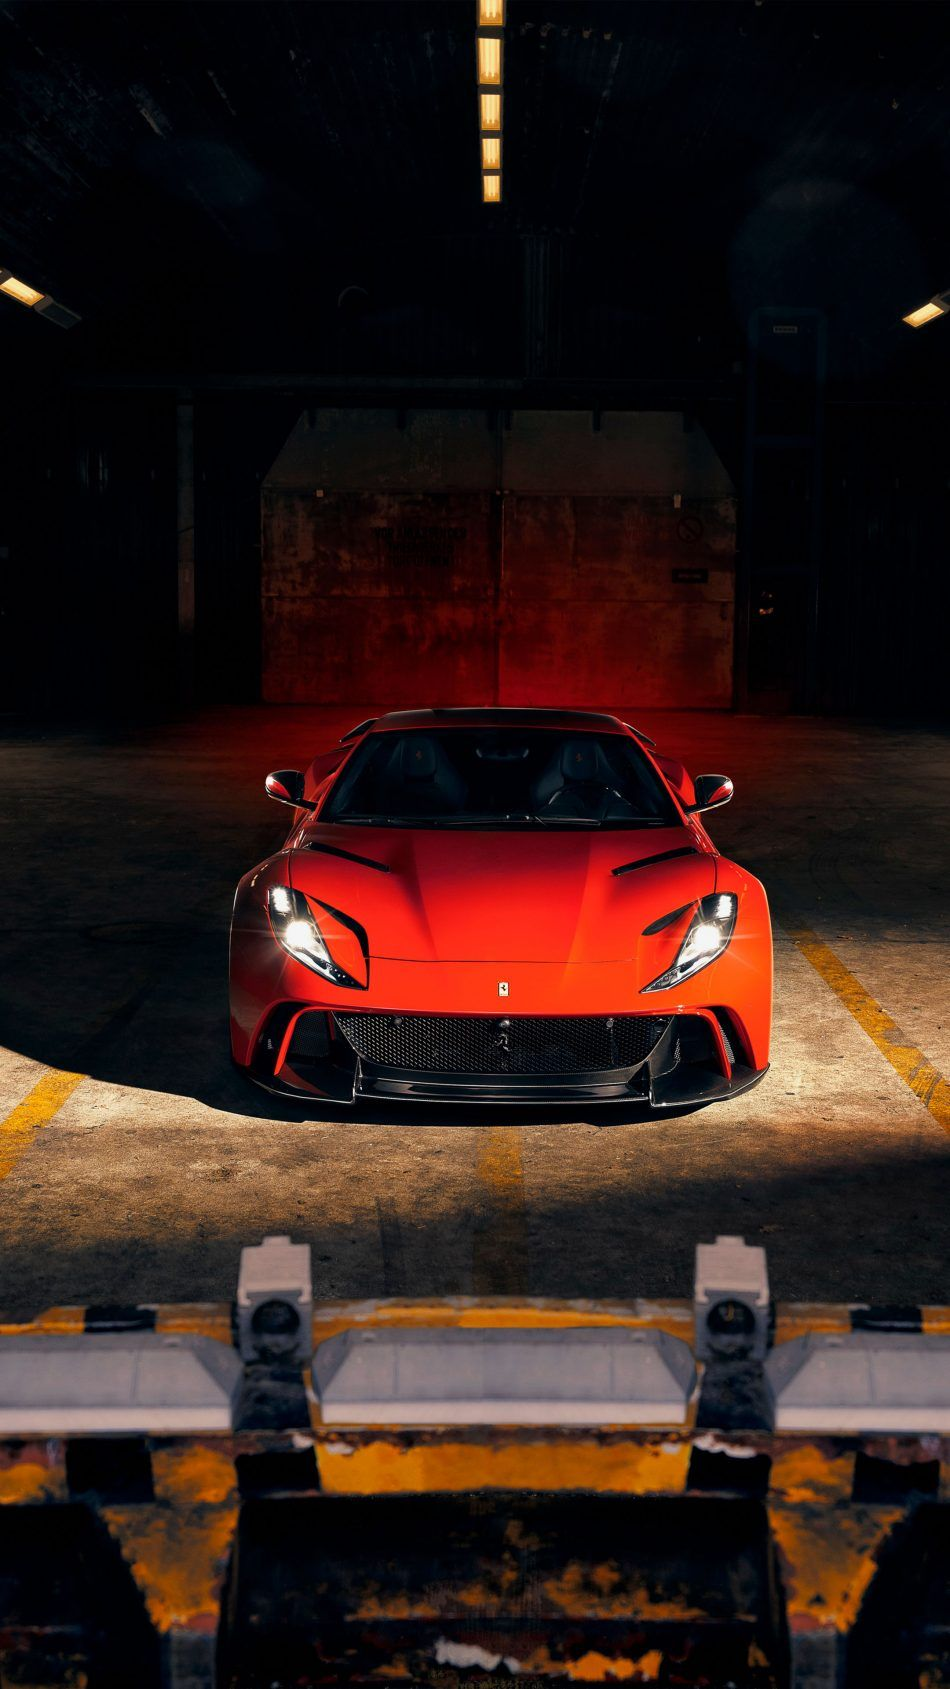 Ferrari 812 Superfast N Largo 4k Ultra Hd Mobile Wallpaper Car Wallpapers Super Luxury Cars Sports Car Wallpaper